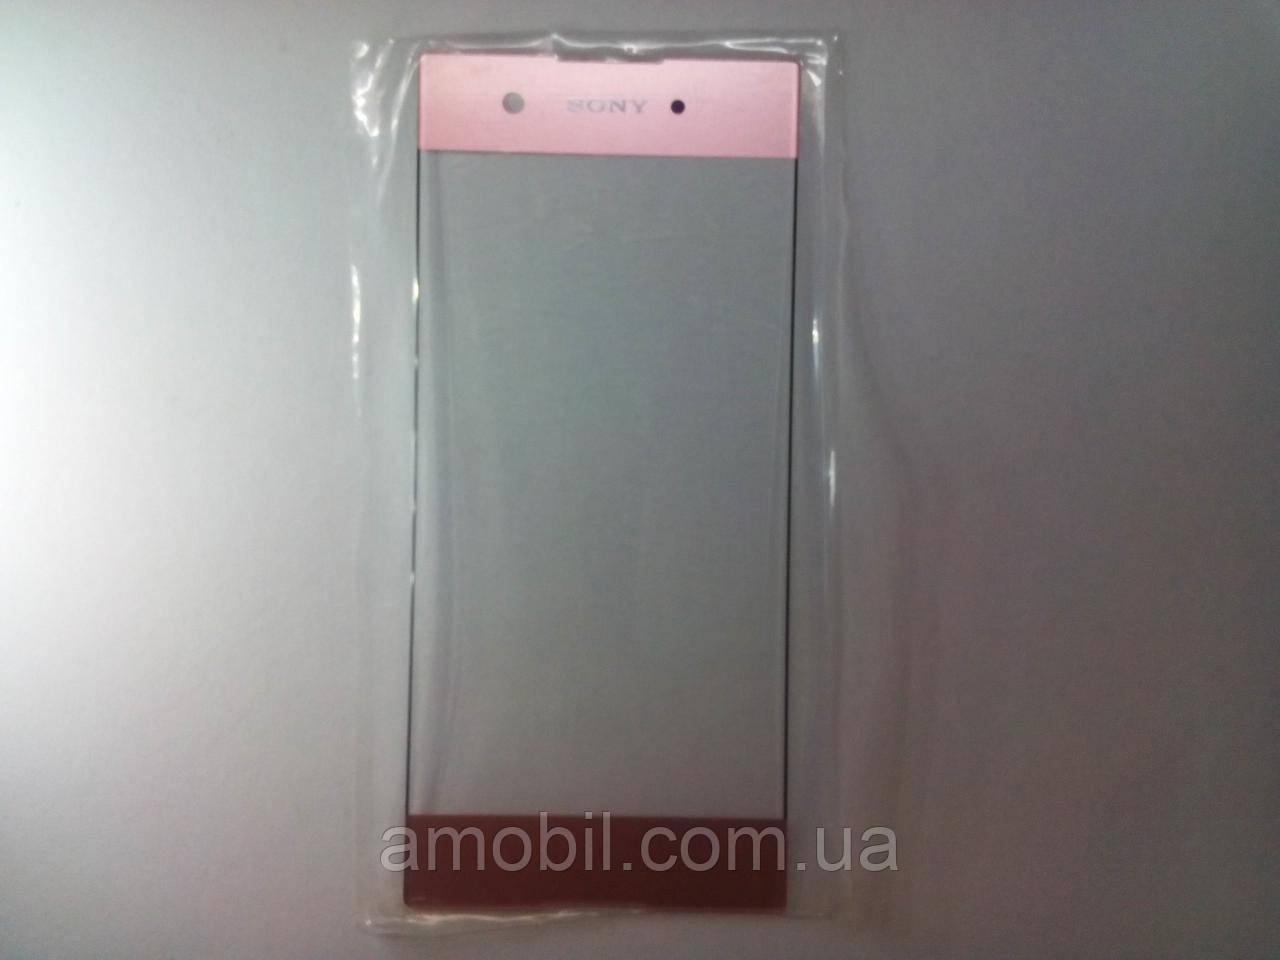 Стекло Sony G3112 Xperia XA1 / G3116 Xperia XA1 / G3121 Xperia XA1 / G3123 Xperia XA1 / G3125 Xperia XA1 pink